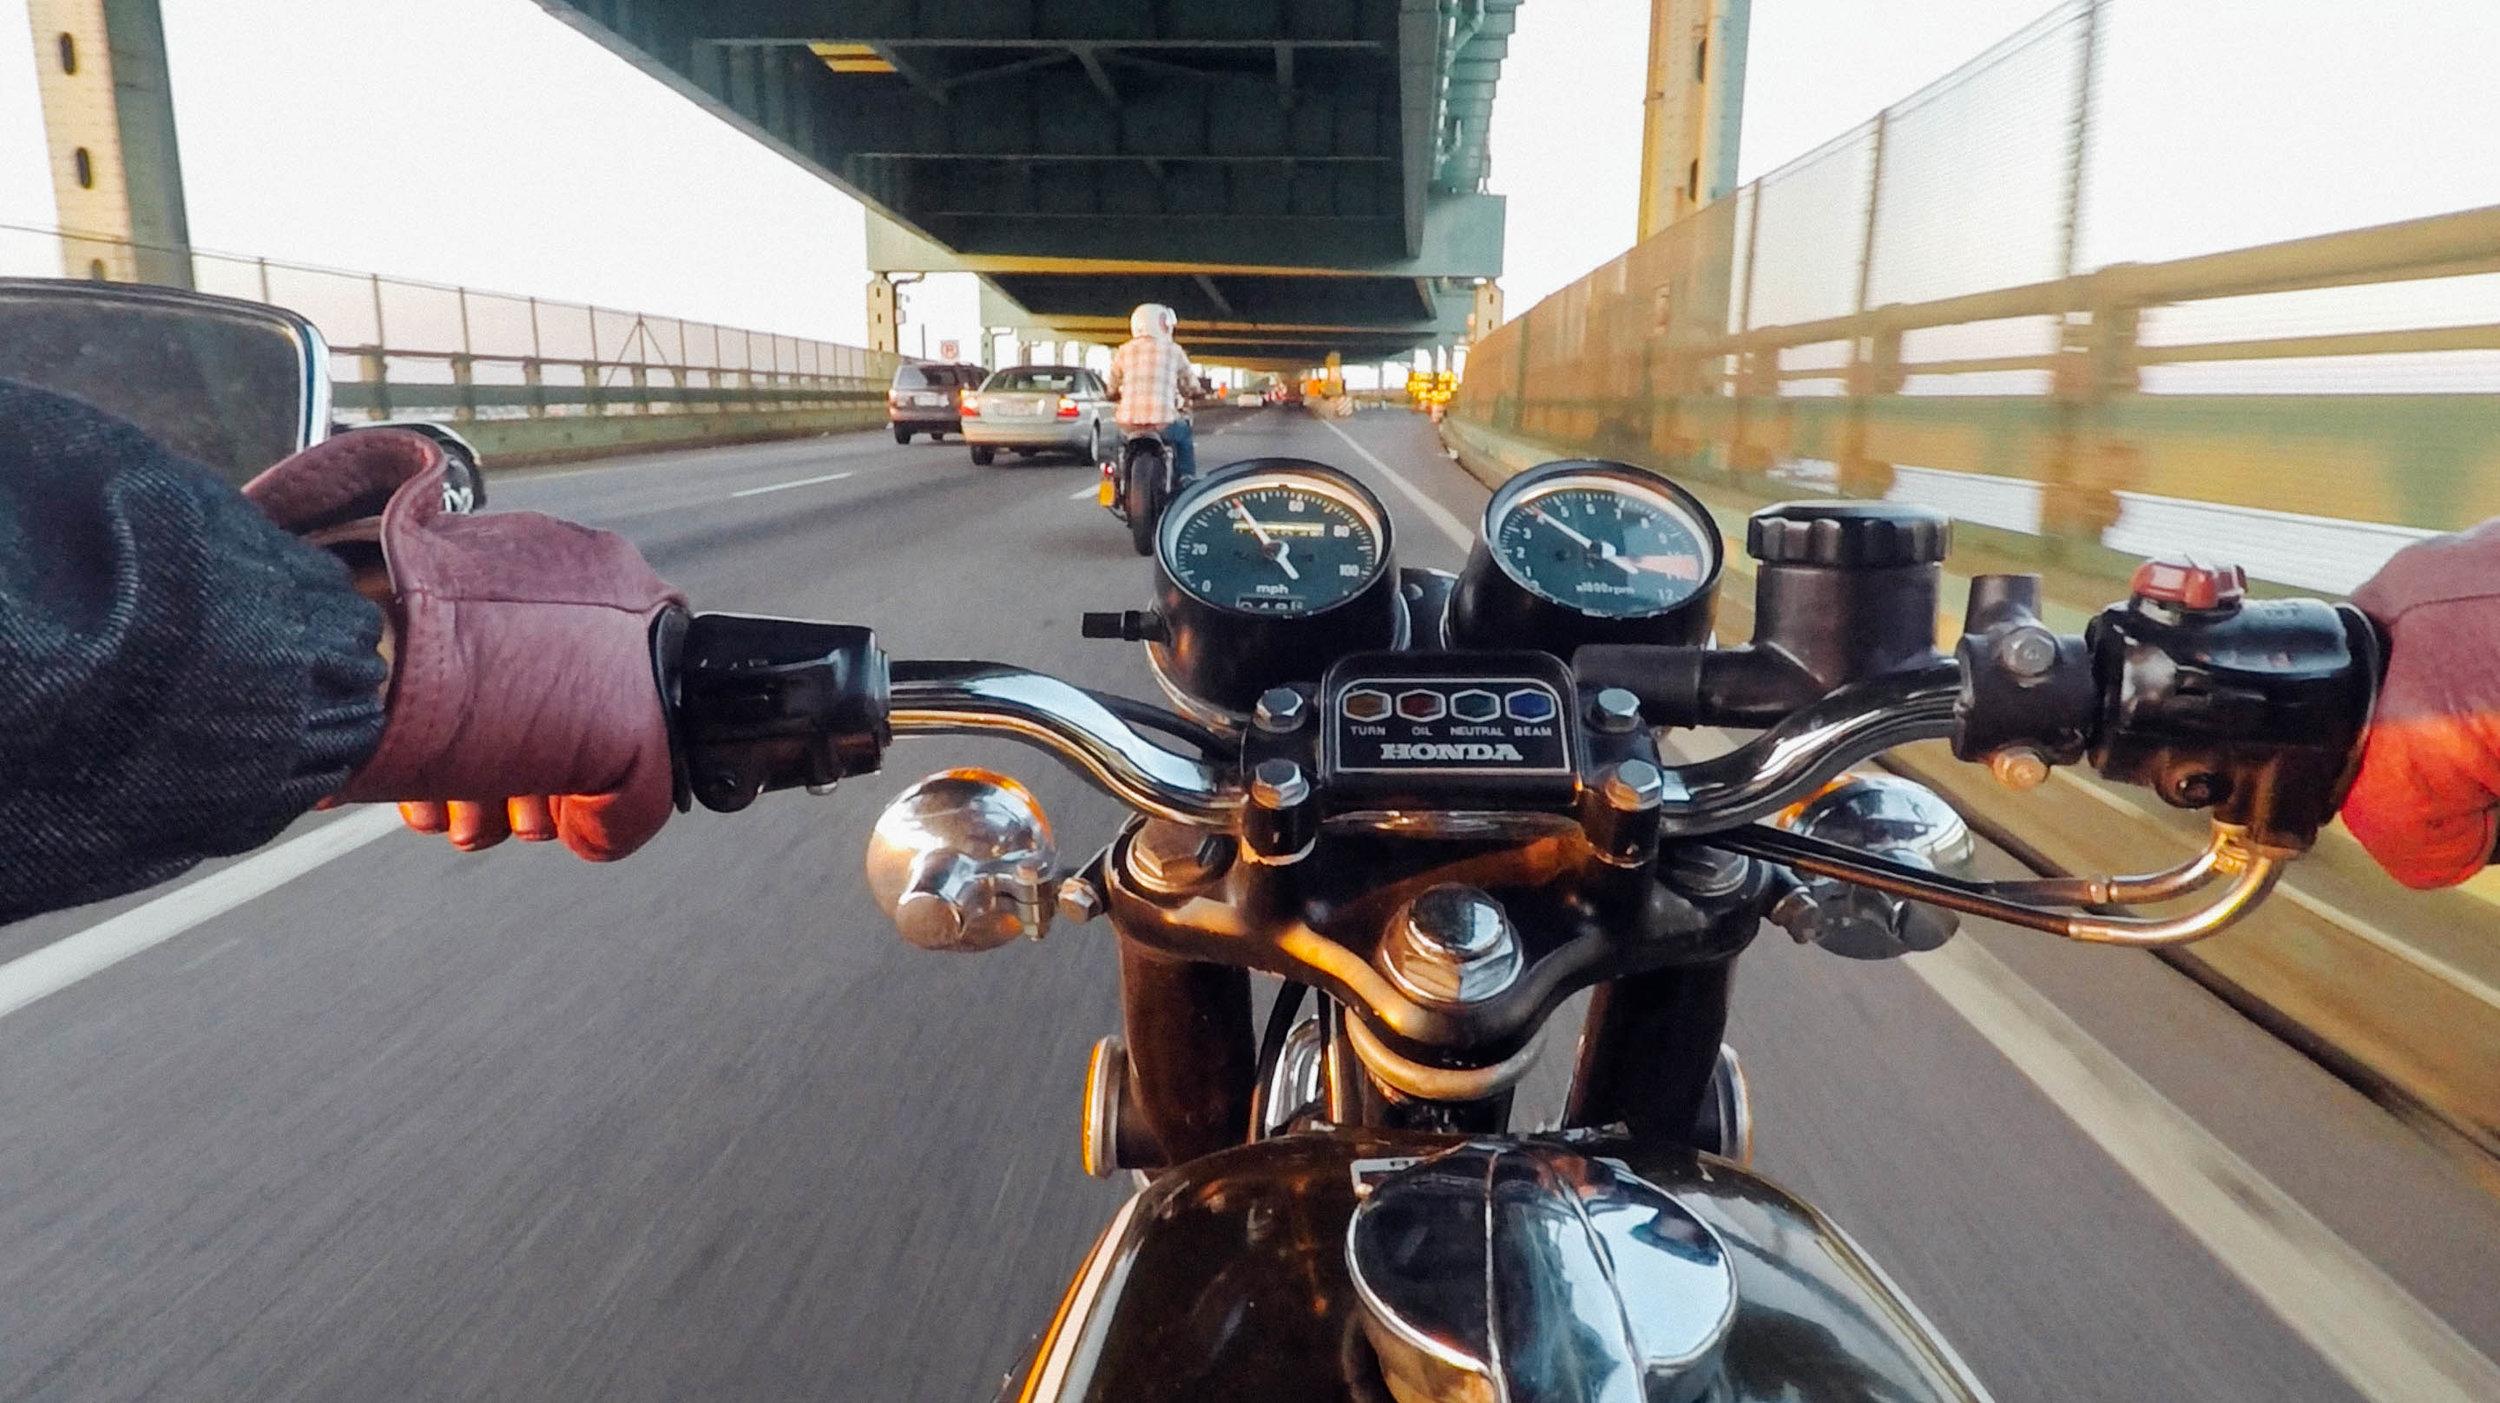 Crossing the Tobin Bridge in Boston. Photo by Kim Maroon